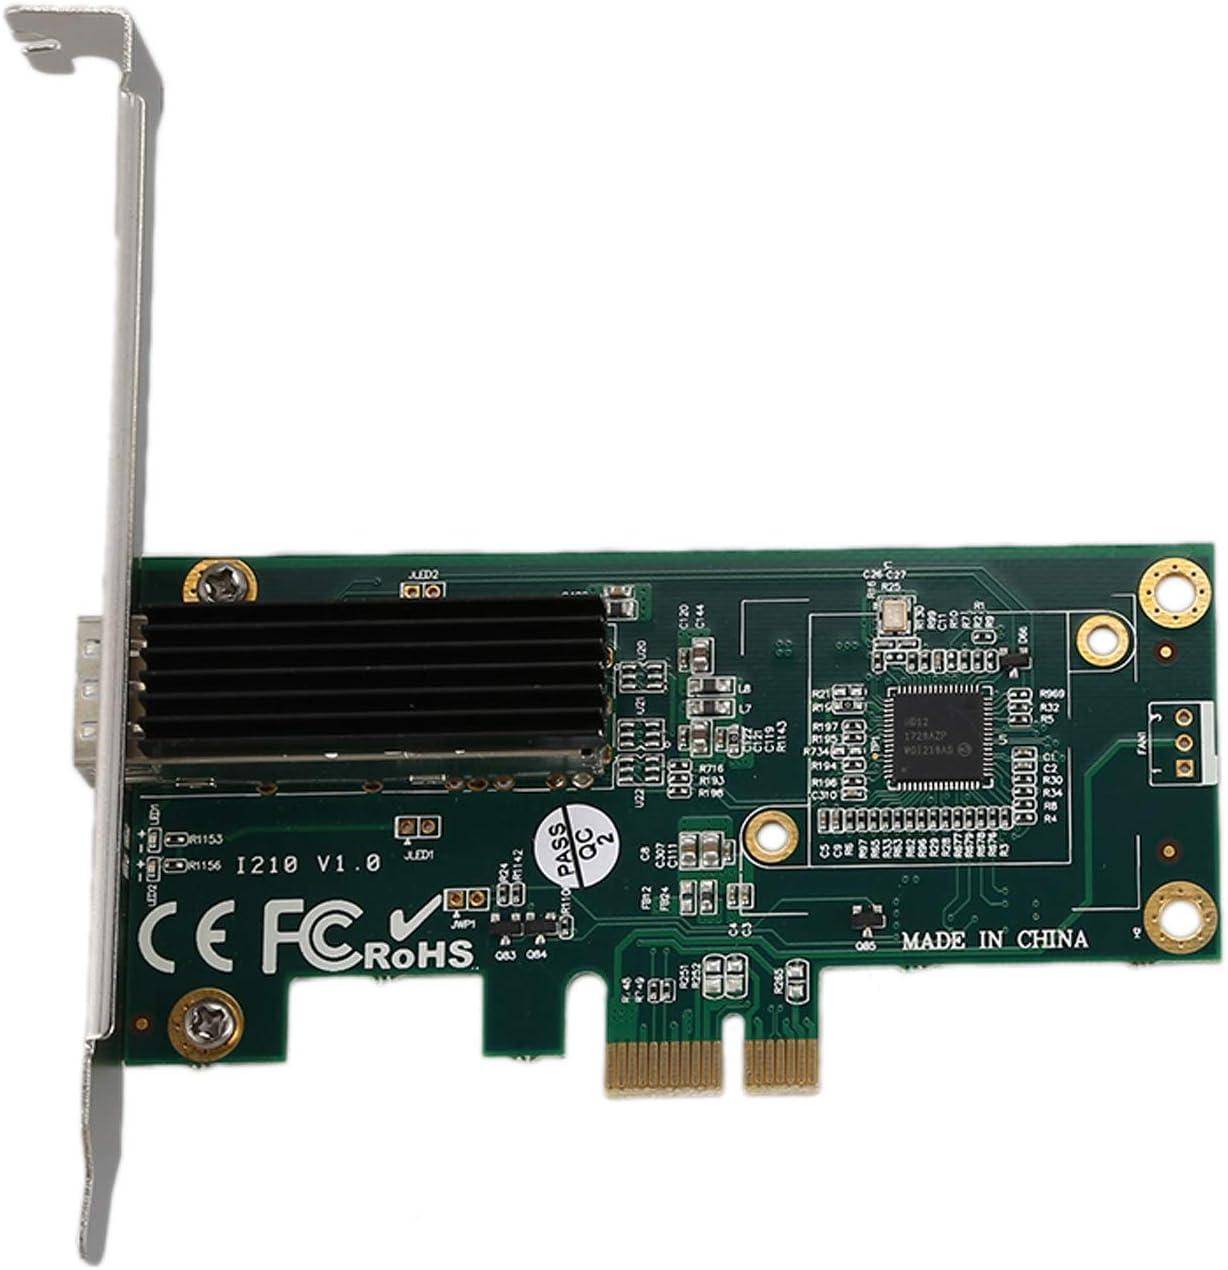 Semoic Network Card for Intel I210 Chip 1G Gigabit Ethernet//Network Card NIC ,Single RJ45 Port,PCI Express 2.1 X1